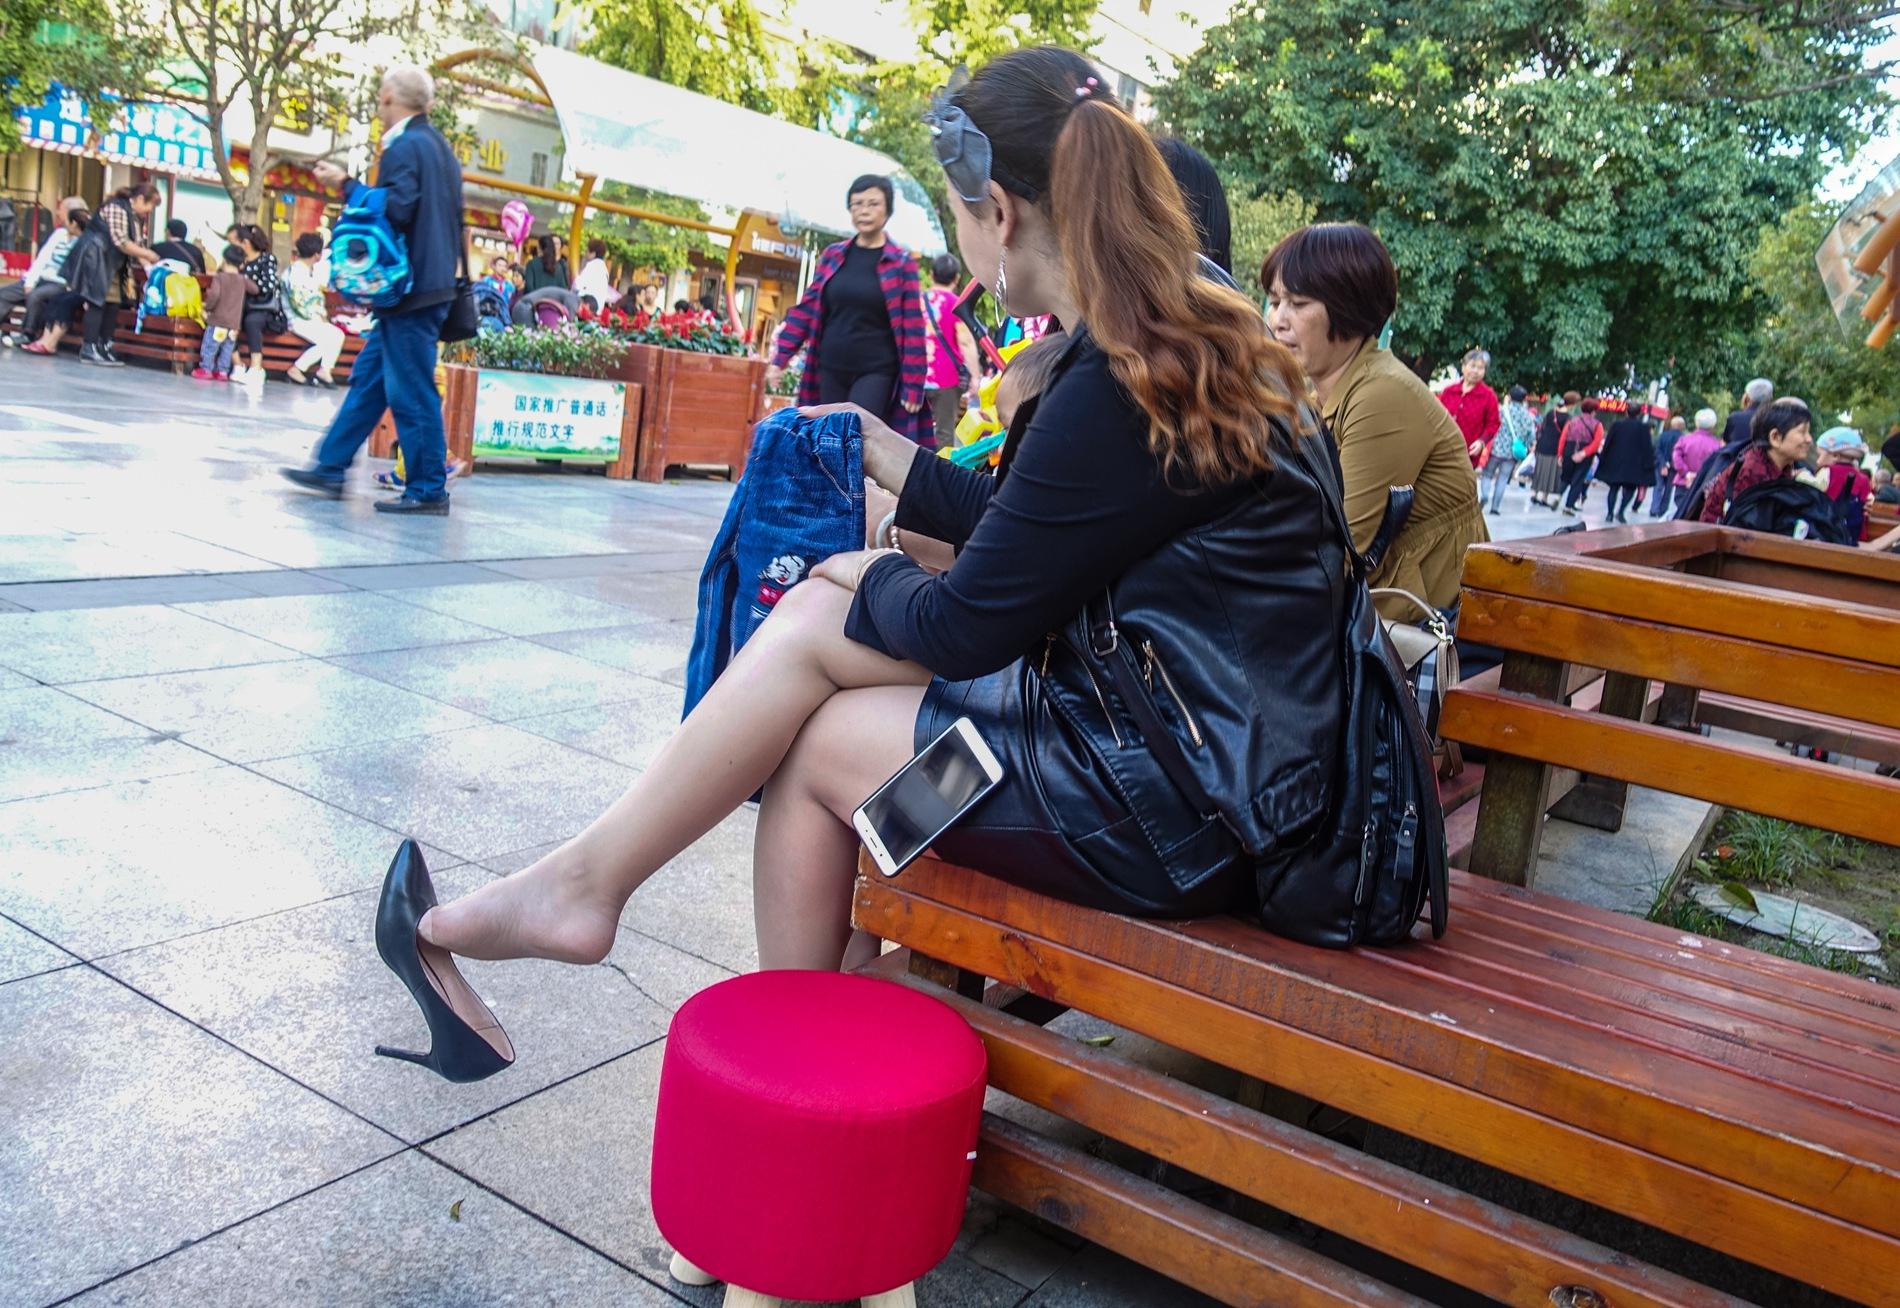 【jim2】黑裙长腿肉街拍丝袜美女(13p) - 签约原创独发作品- 街拍第一站